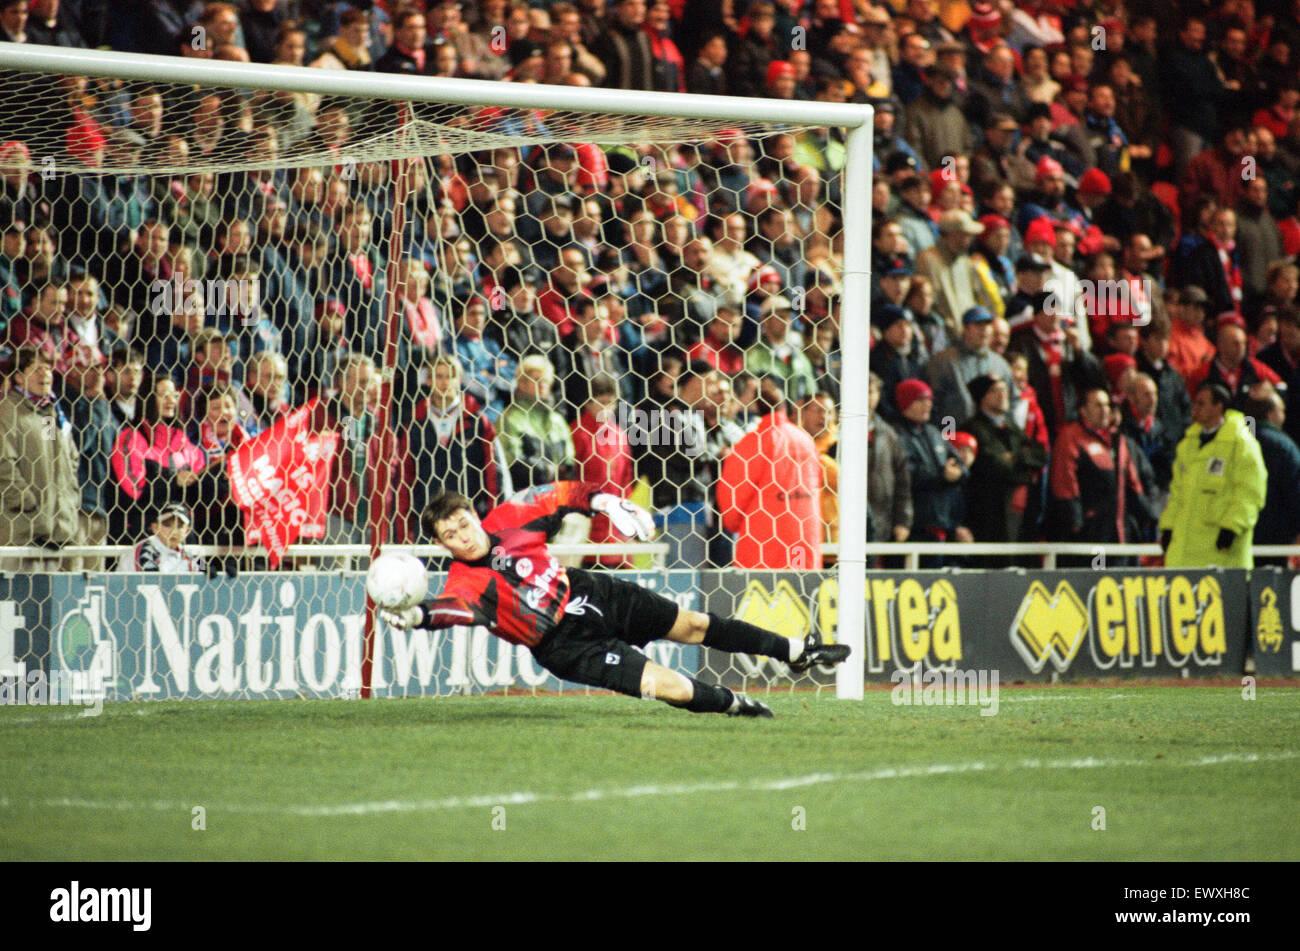 English League Divison One Match Stock Photos & English